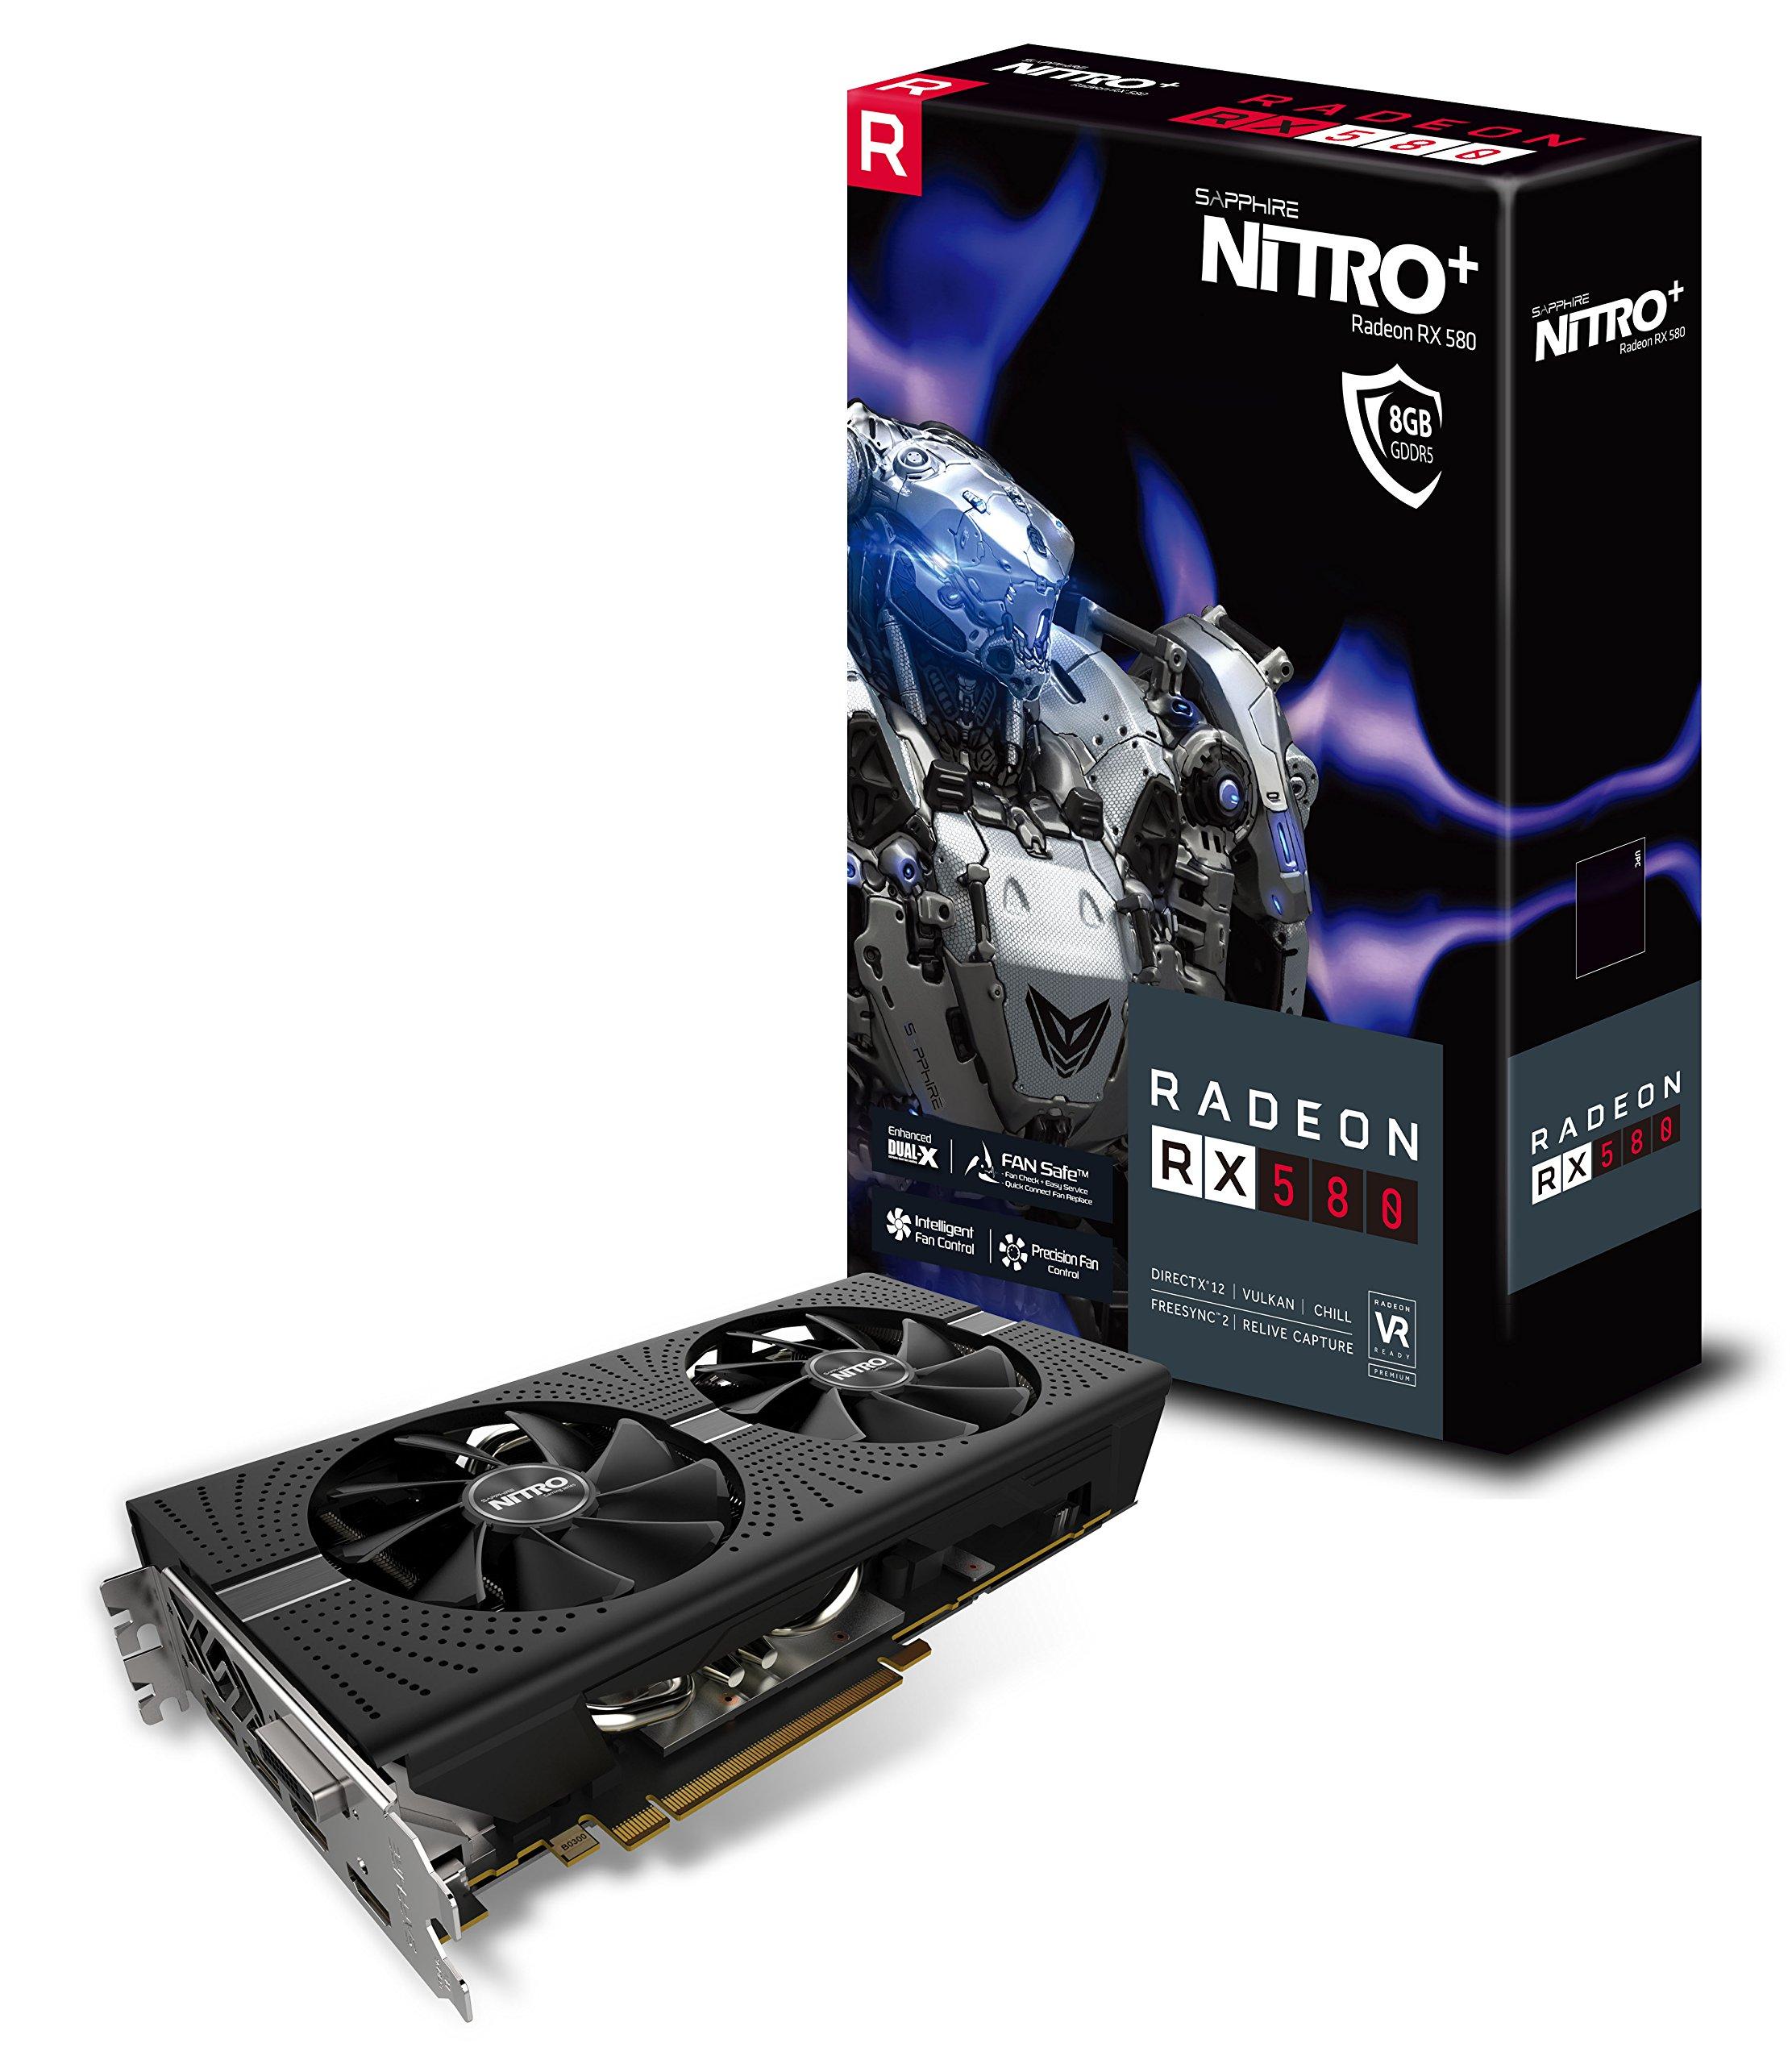 Sapphire 11265-01-20G Radeon NITRO+ RX 580 8GB GDDR5 DUAL HDMI / DVI-D / DUAL DP with backplate (UEFI) PCI-E Graphics Card